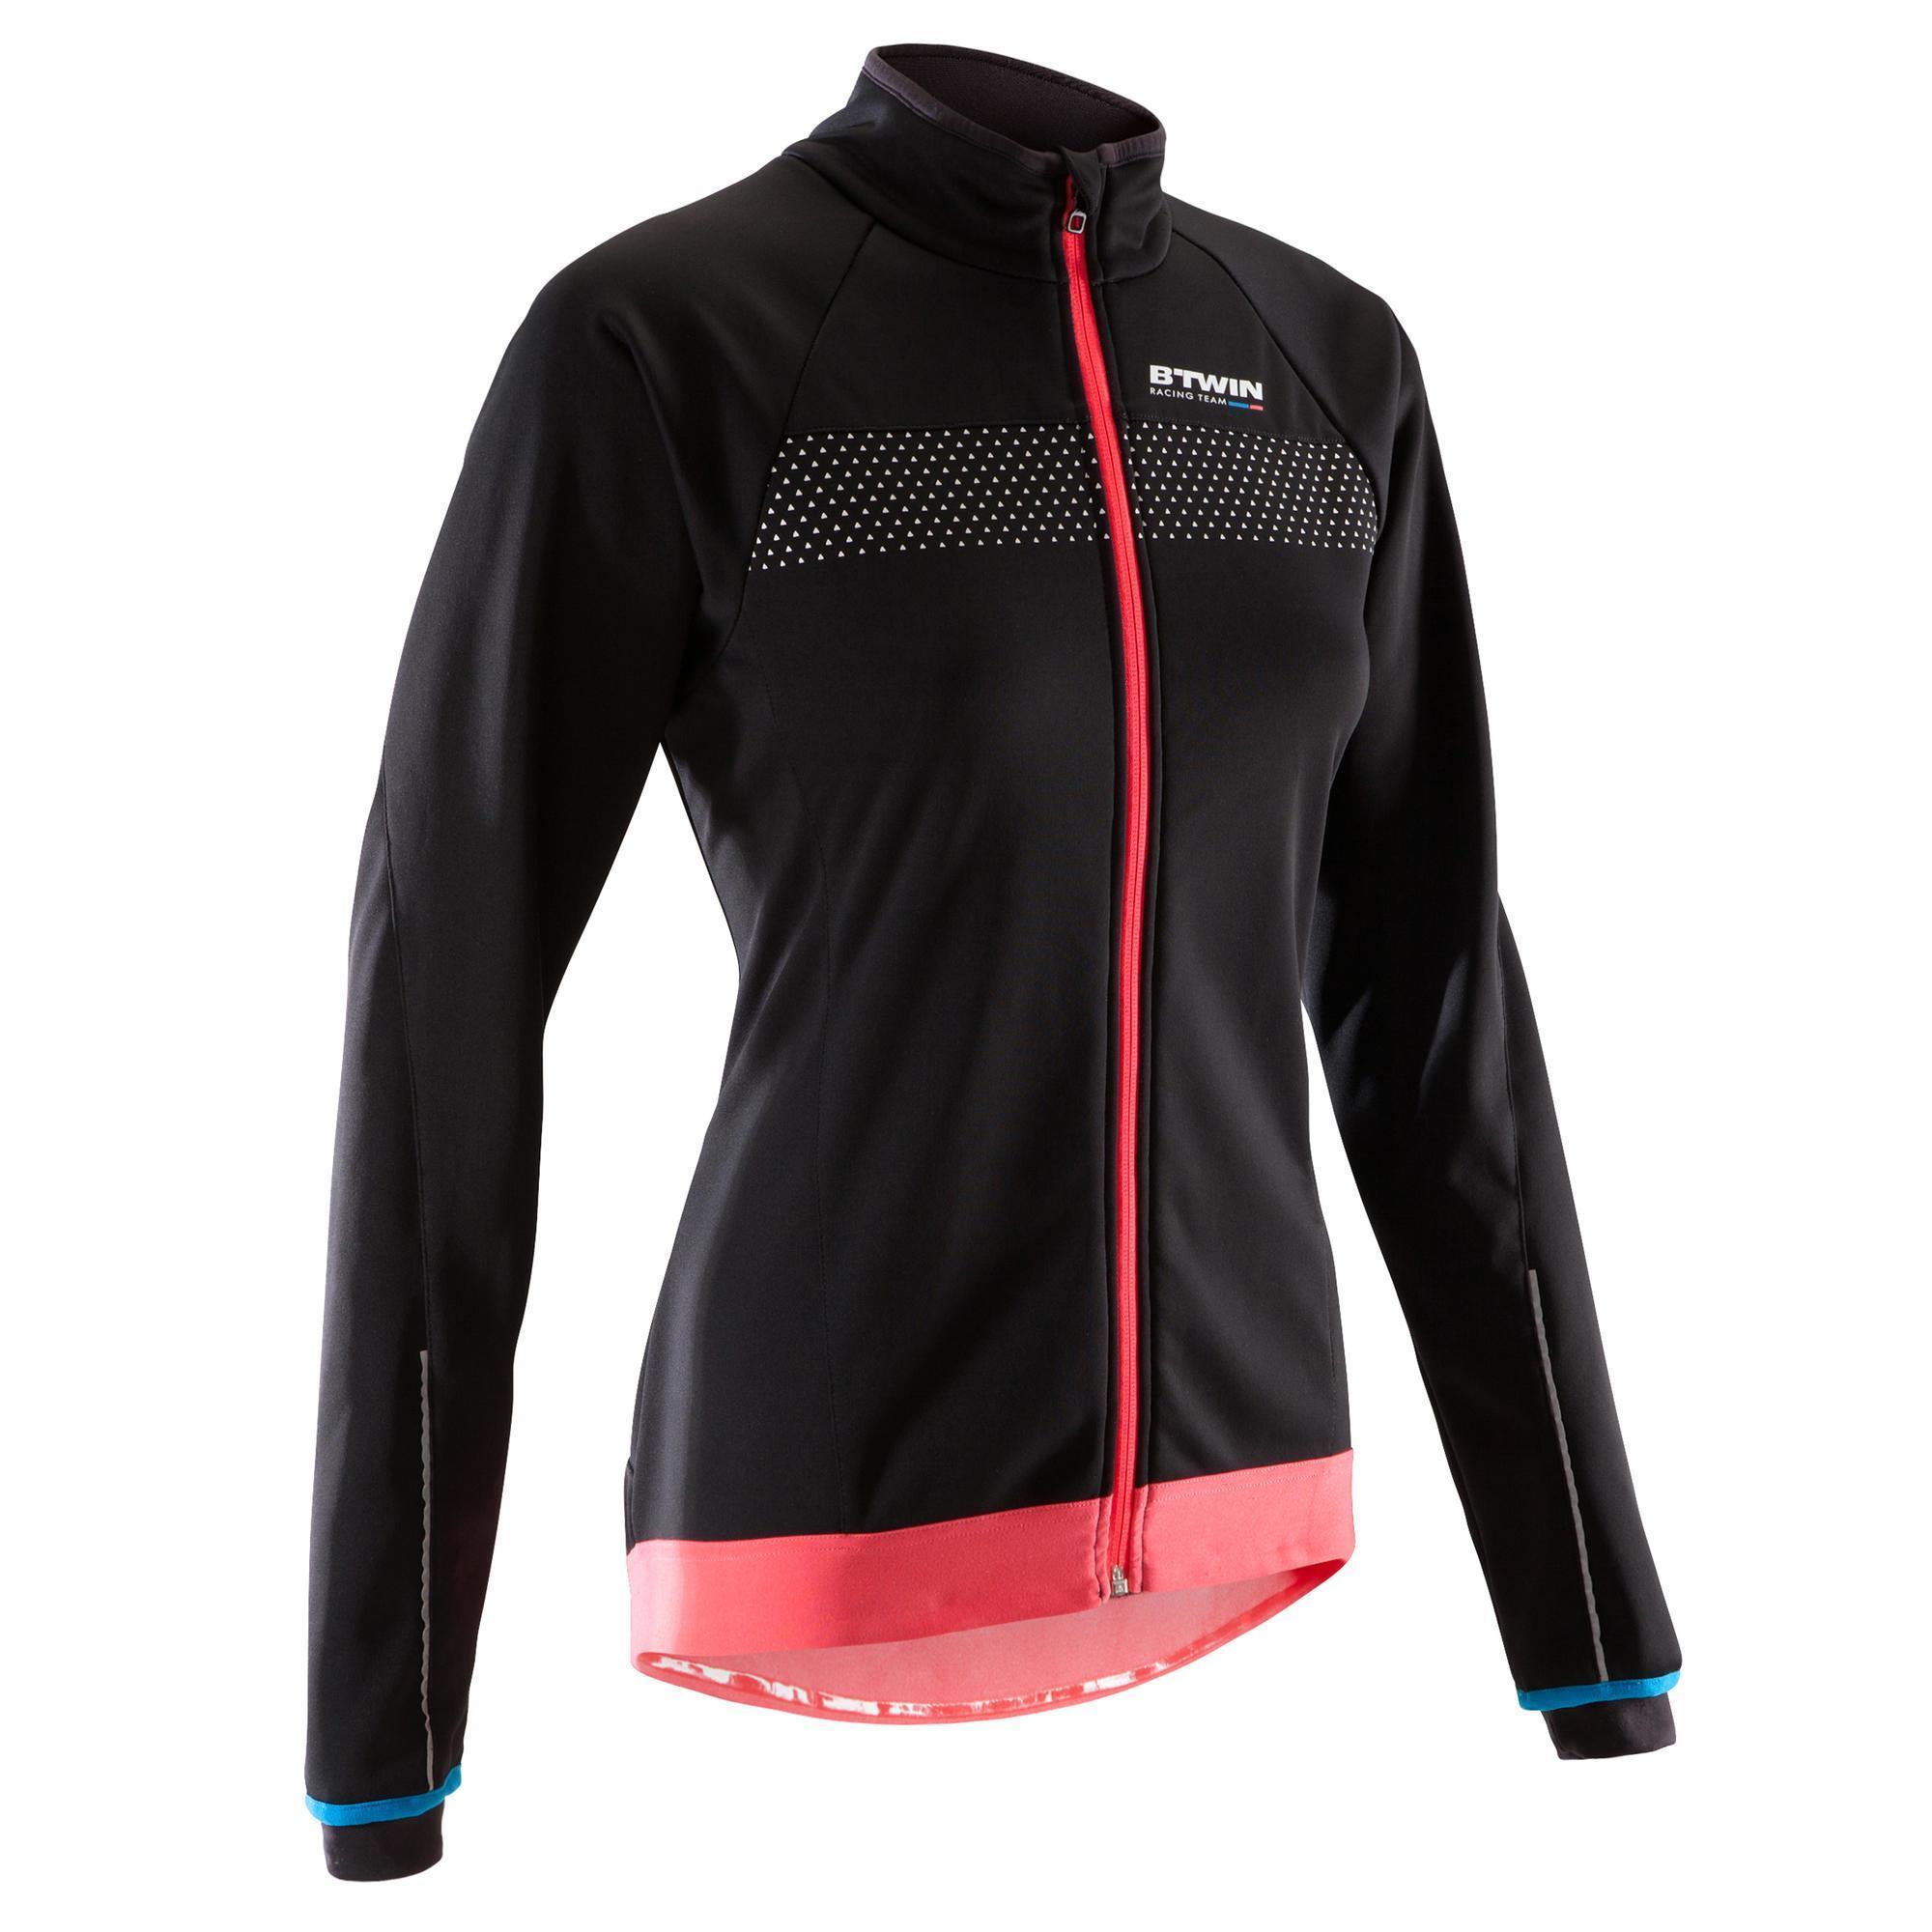 0071562fc12 Chaqueta ciclismo carretera INVIERNO 900 MUJER negra Van rysel | Decathlon